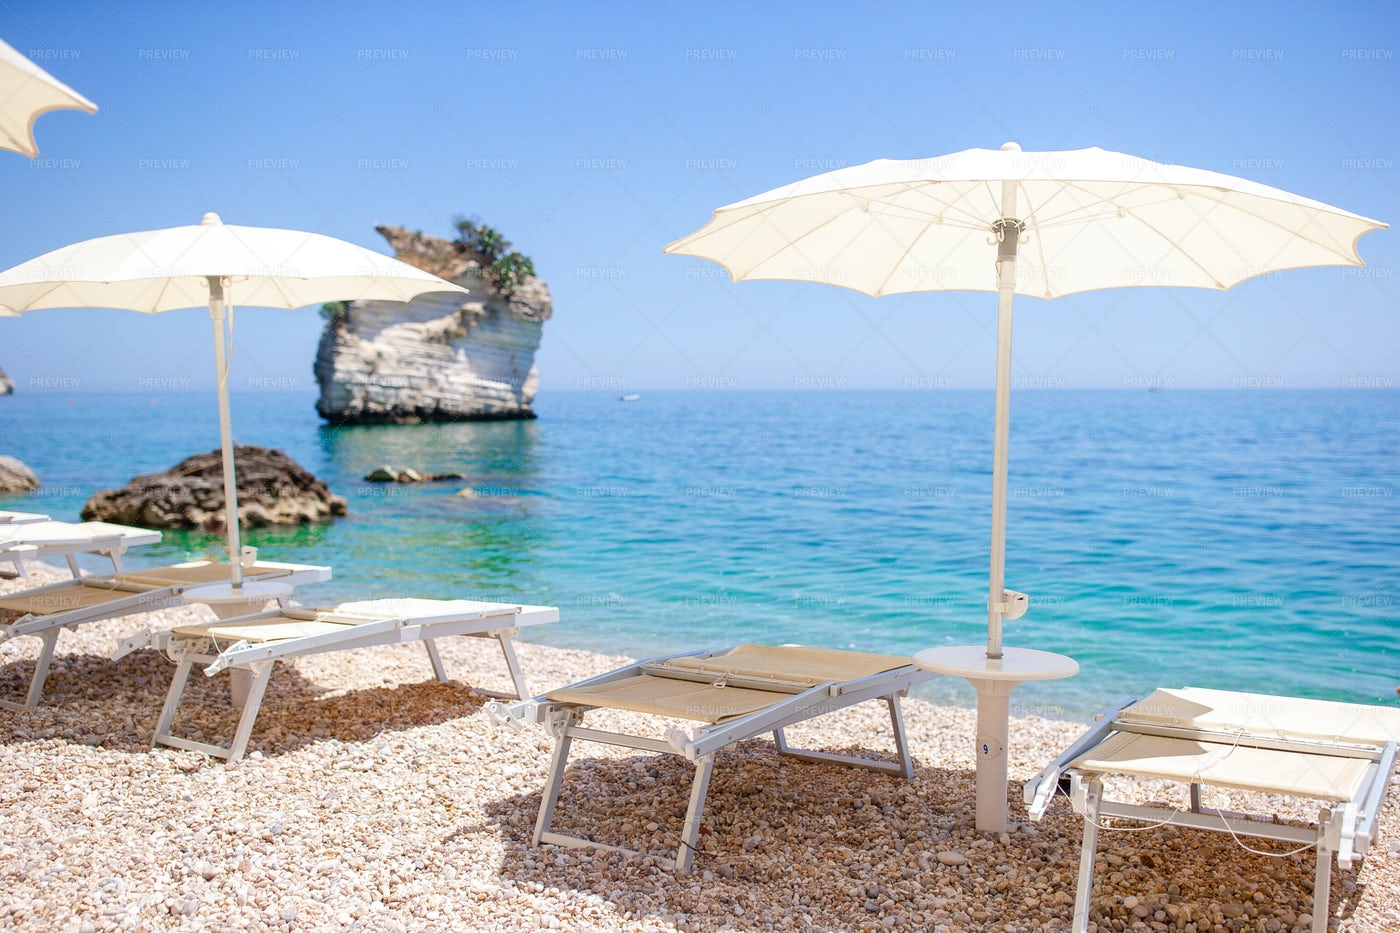 White Umbrella And Sunbeds: Stock Photos